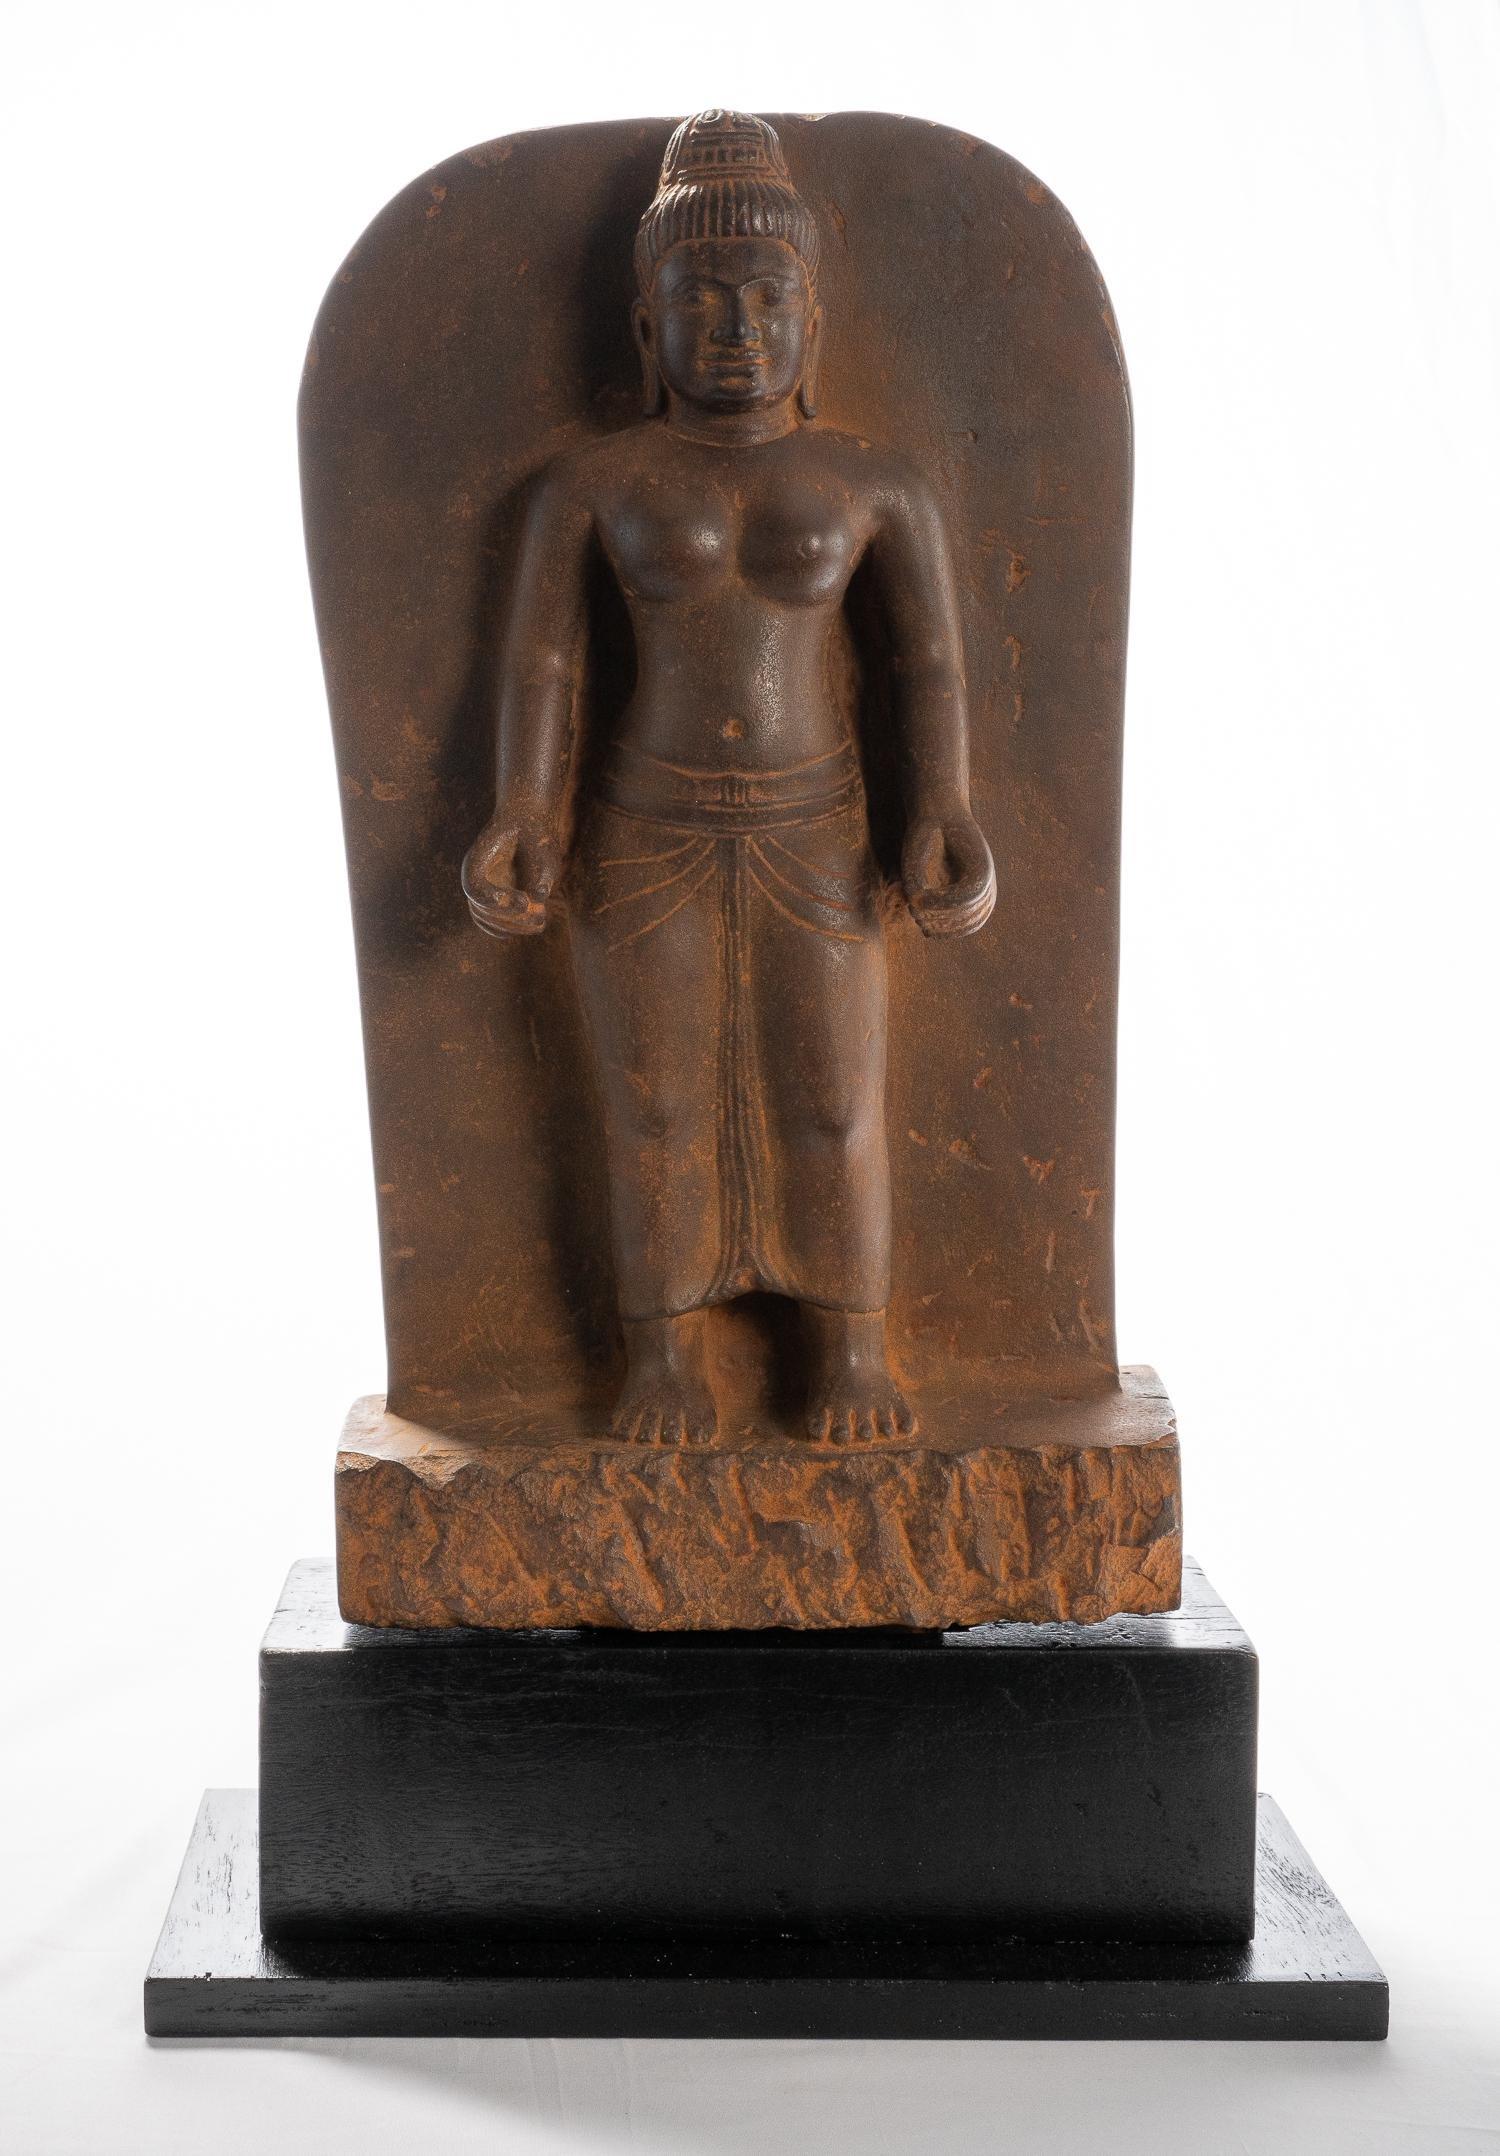 Antique Khmer Style Phnom Da Stone Stele - Lakshmi